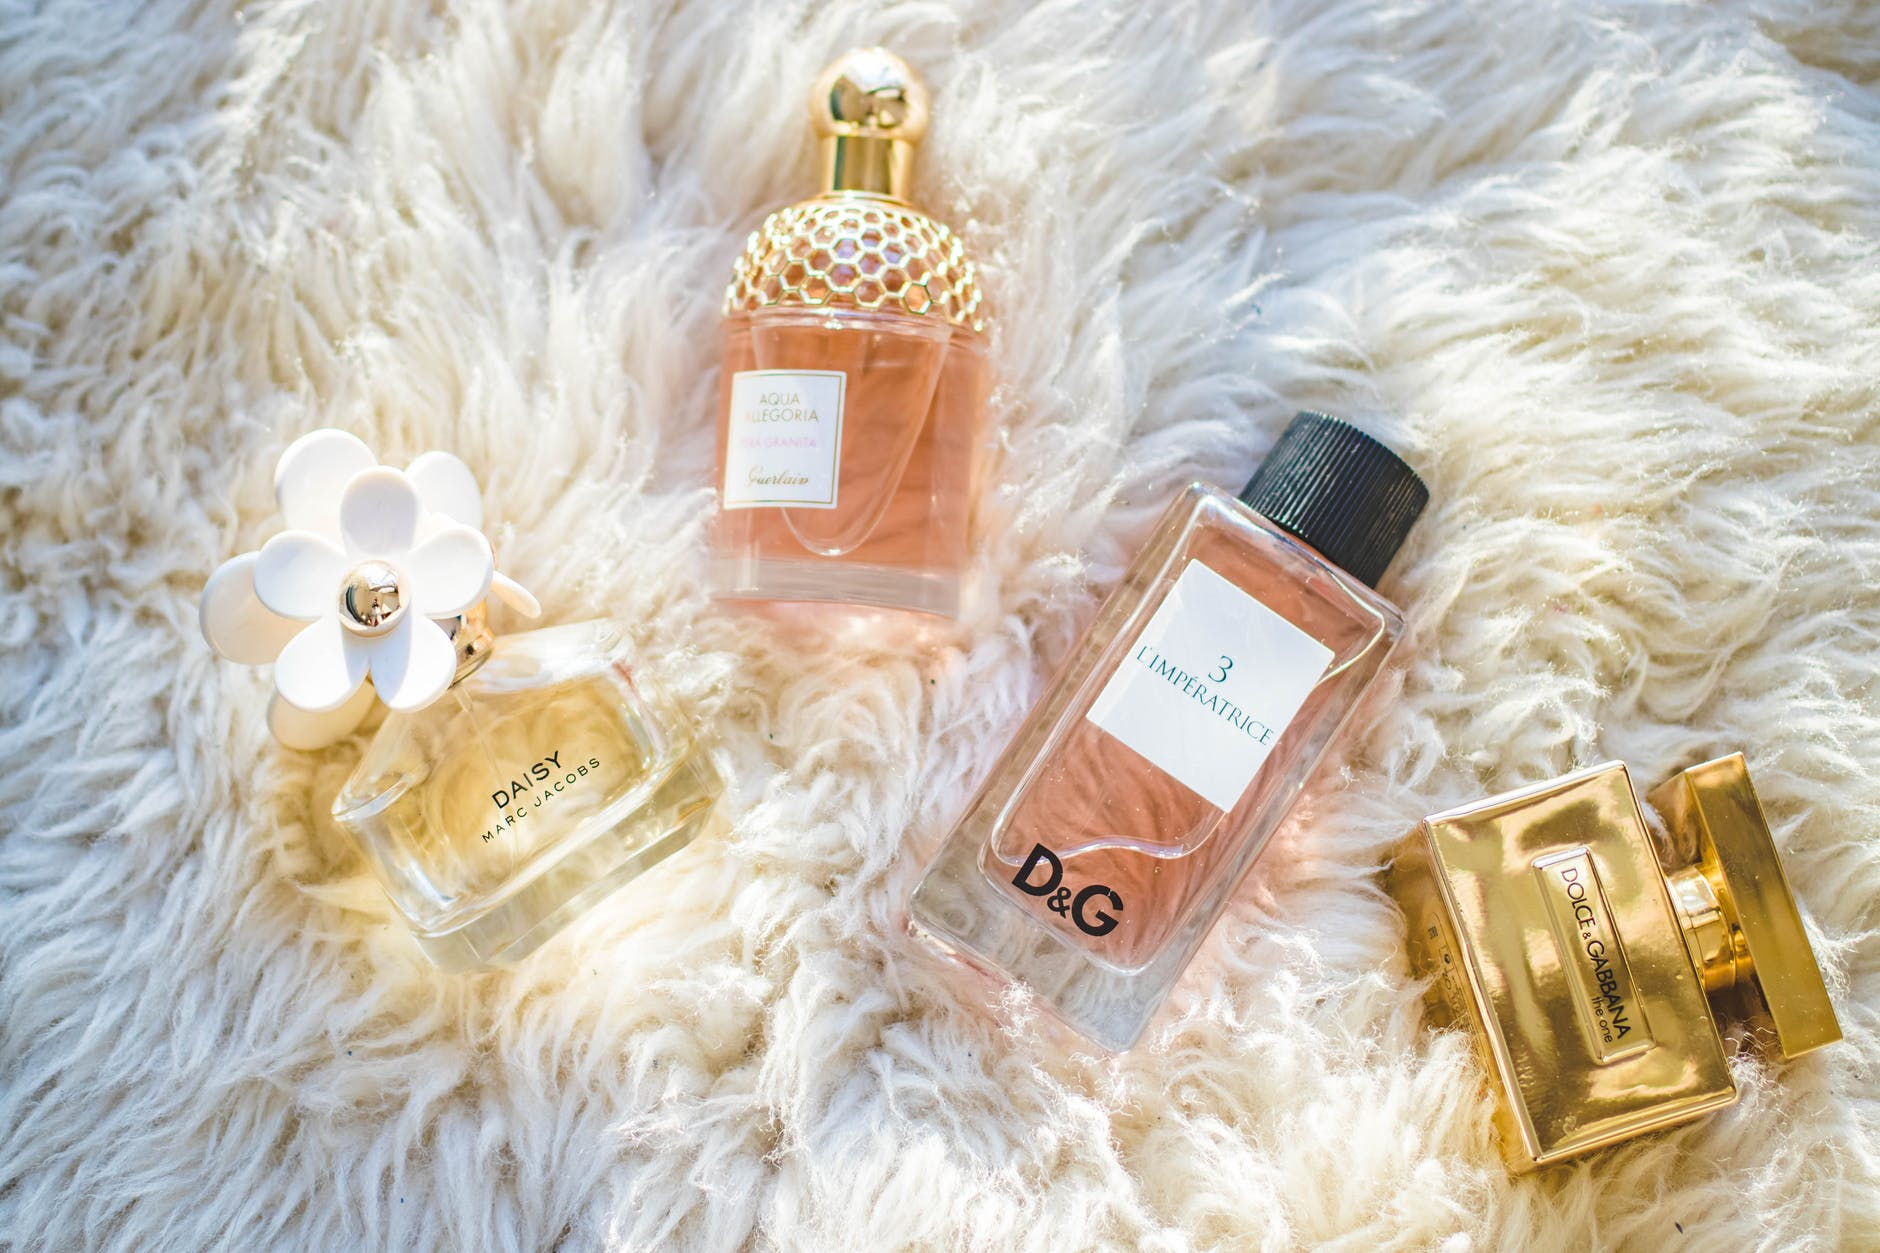 Meu perfume preferido